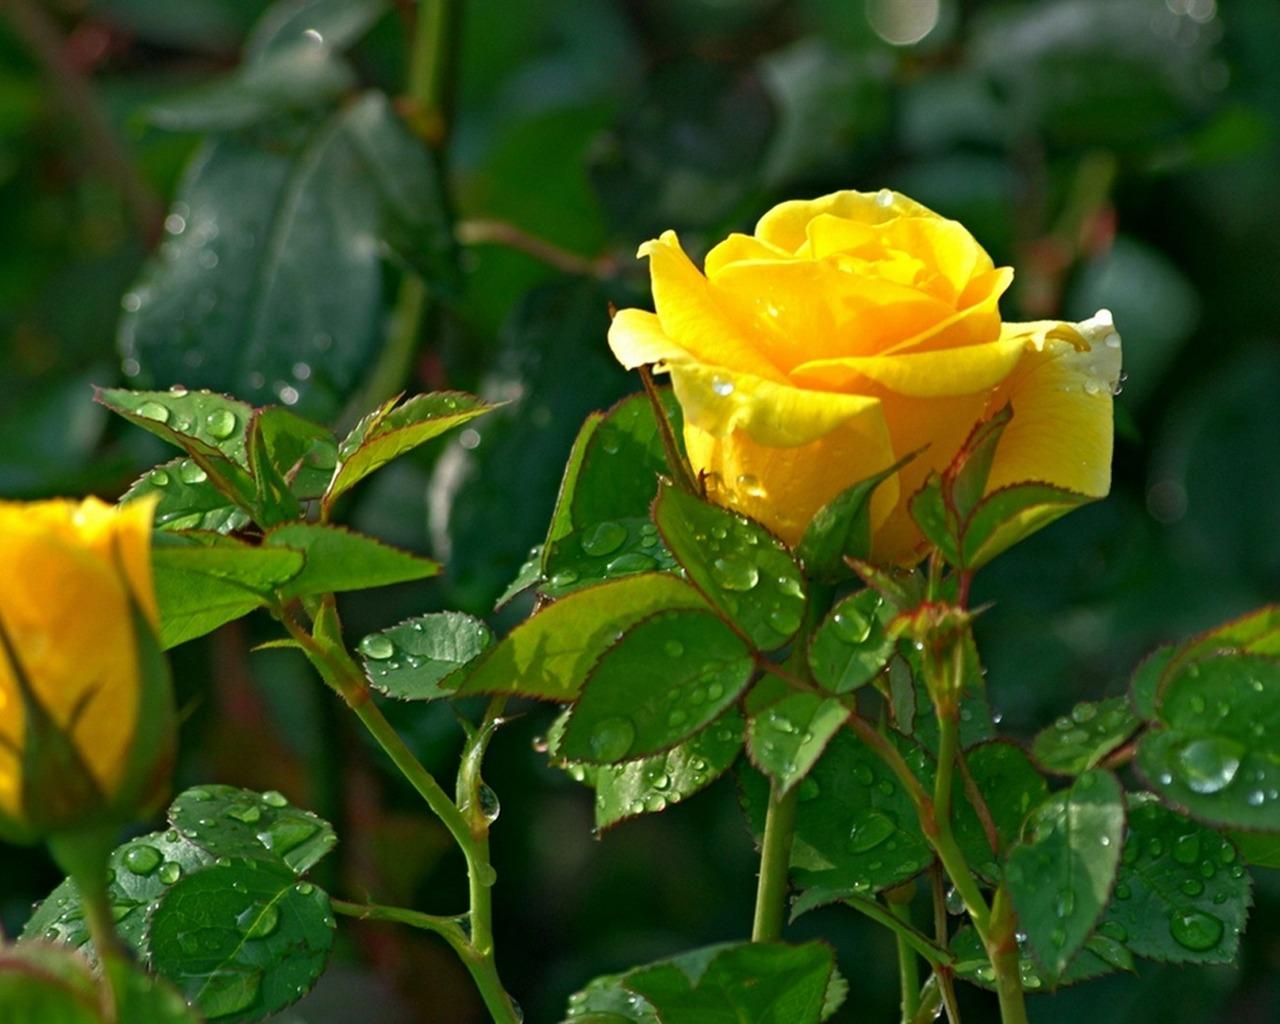 yellow rose-flower photography wallpaper Preview ...  Yellow Rose Flowers Wallpapers For Desktop